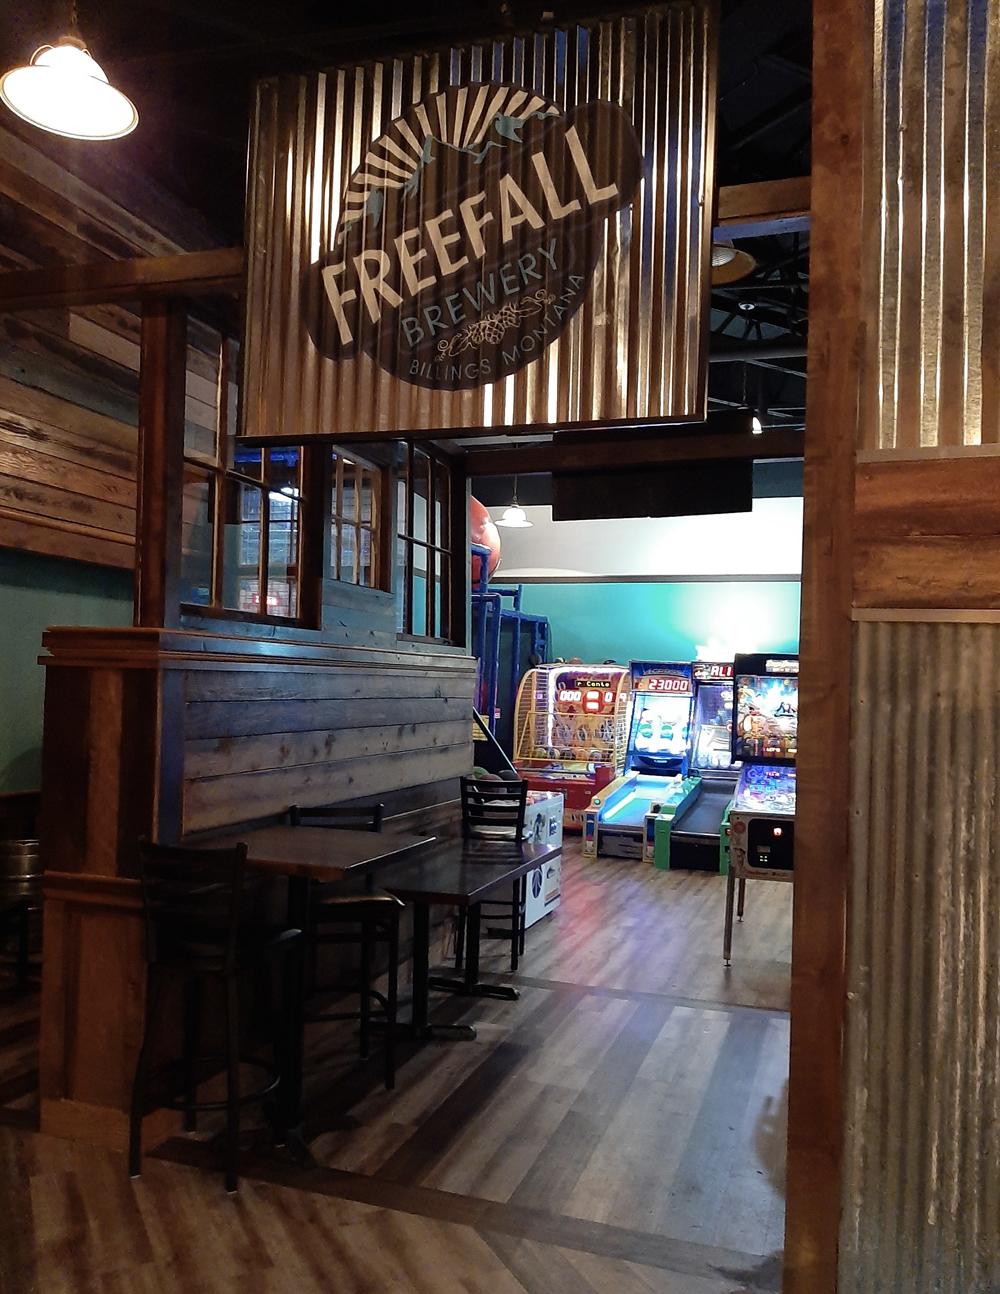 freefall brewery